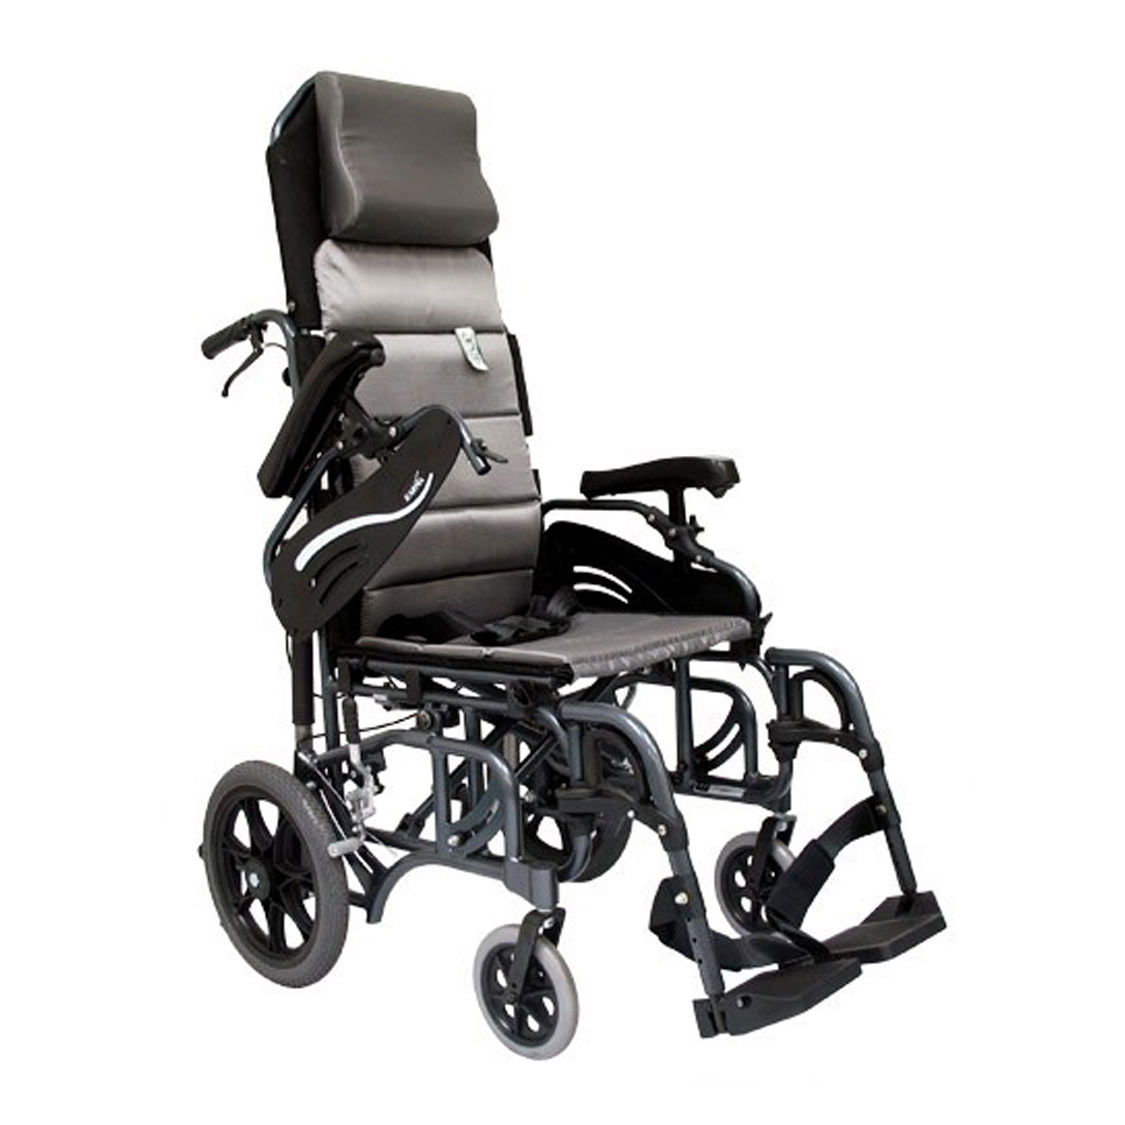 Karman healthcare tilt-in-space transport wheelchair